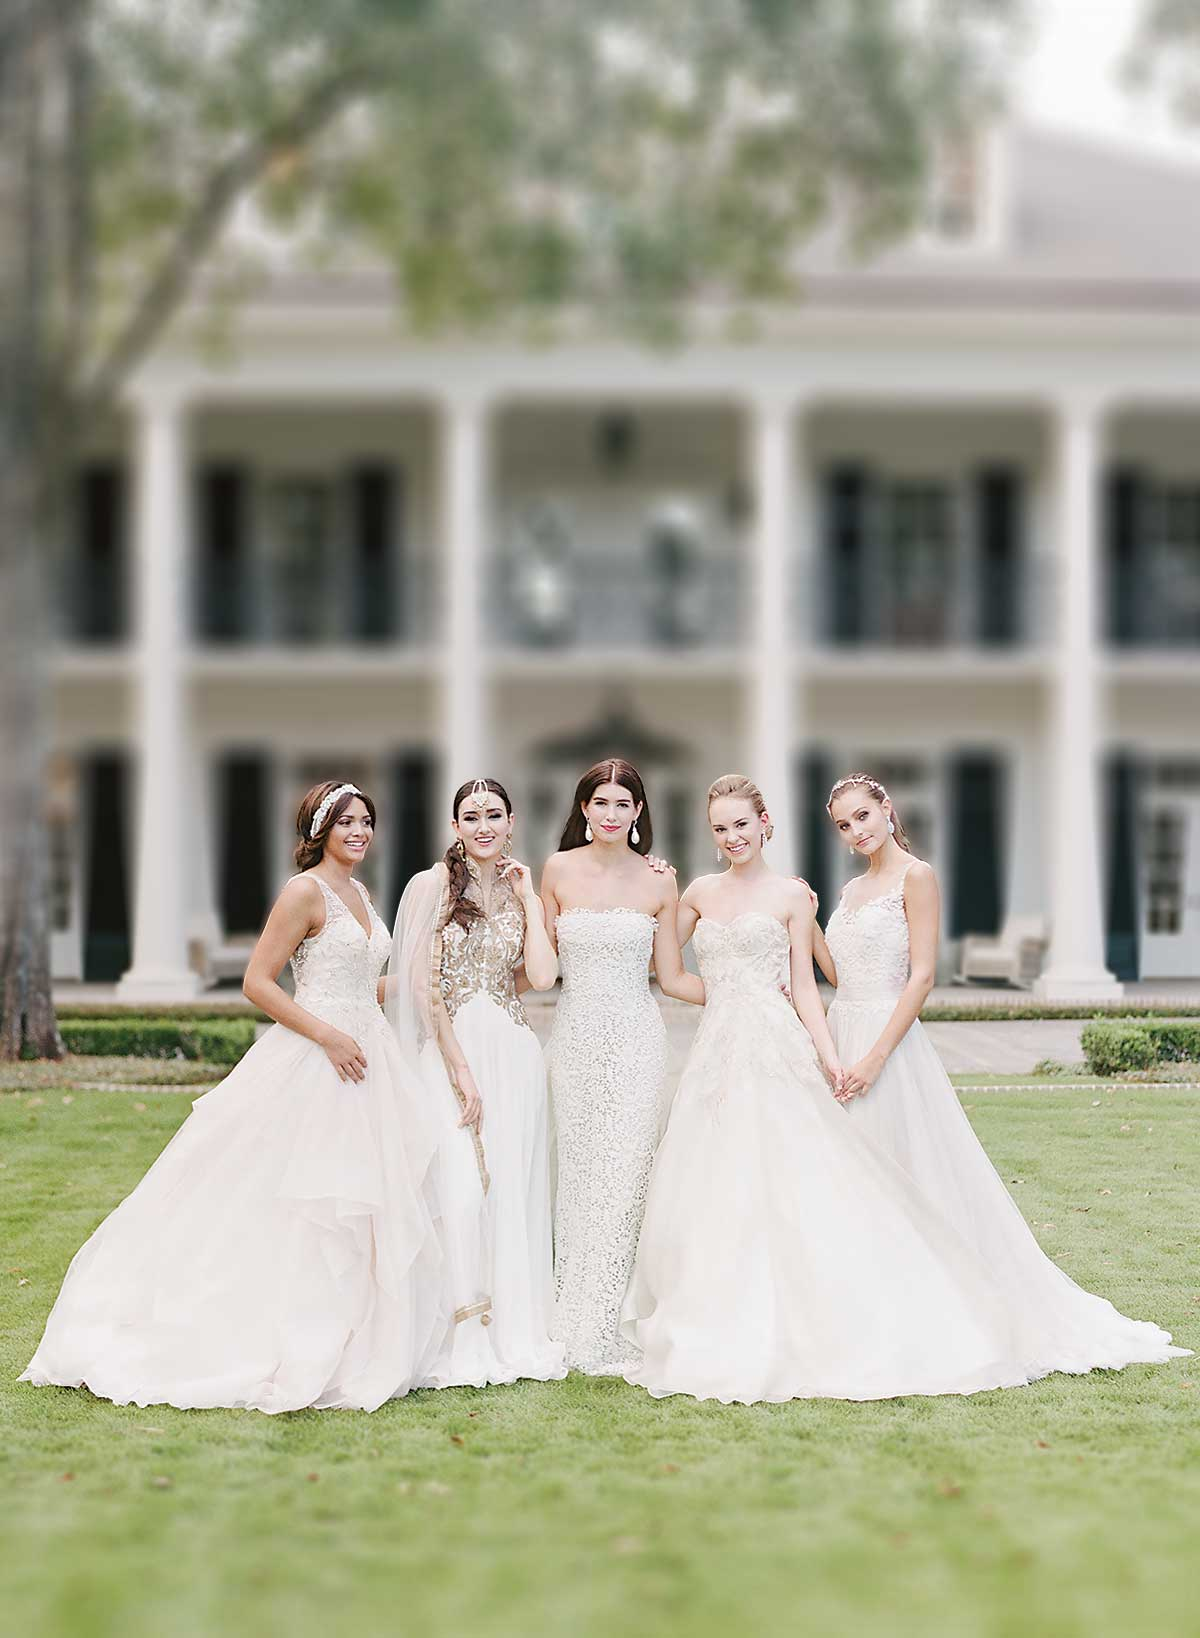 The New American Bride Weddings In